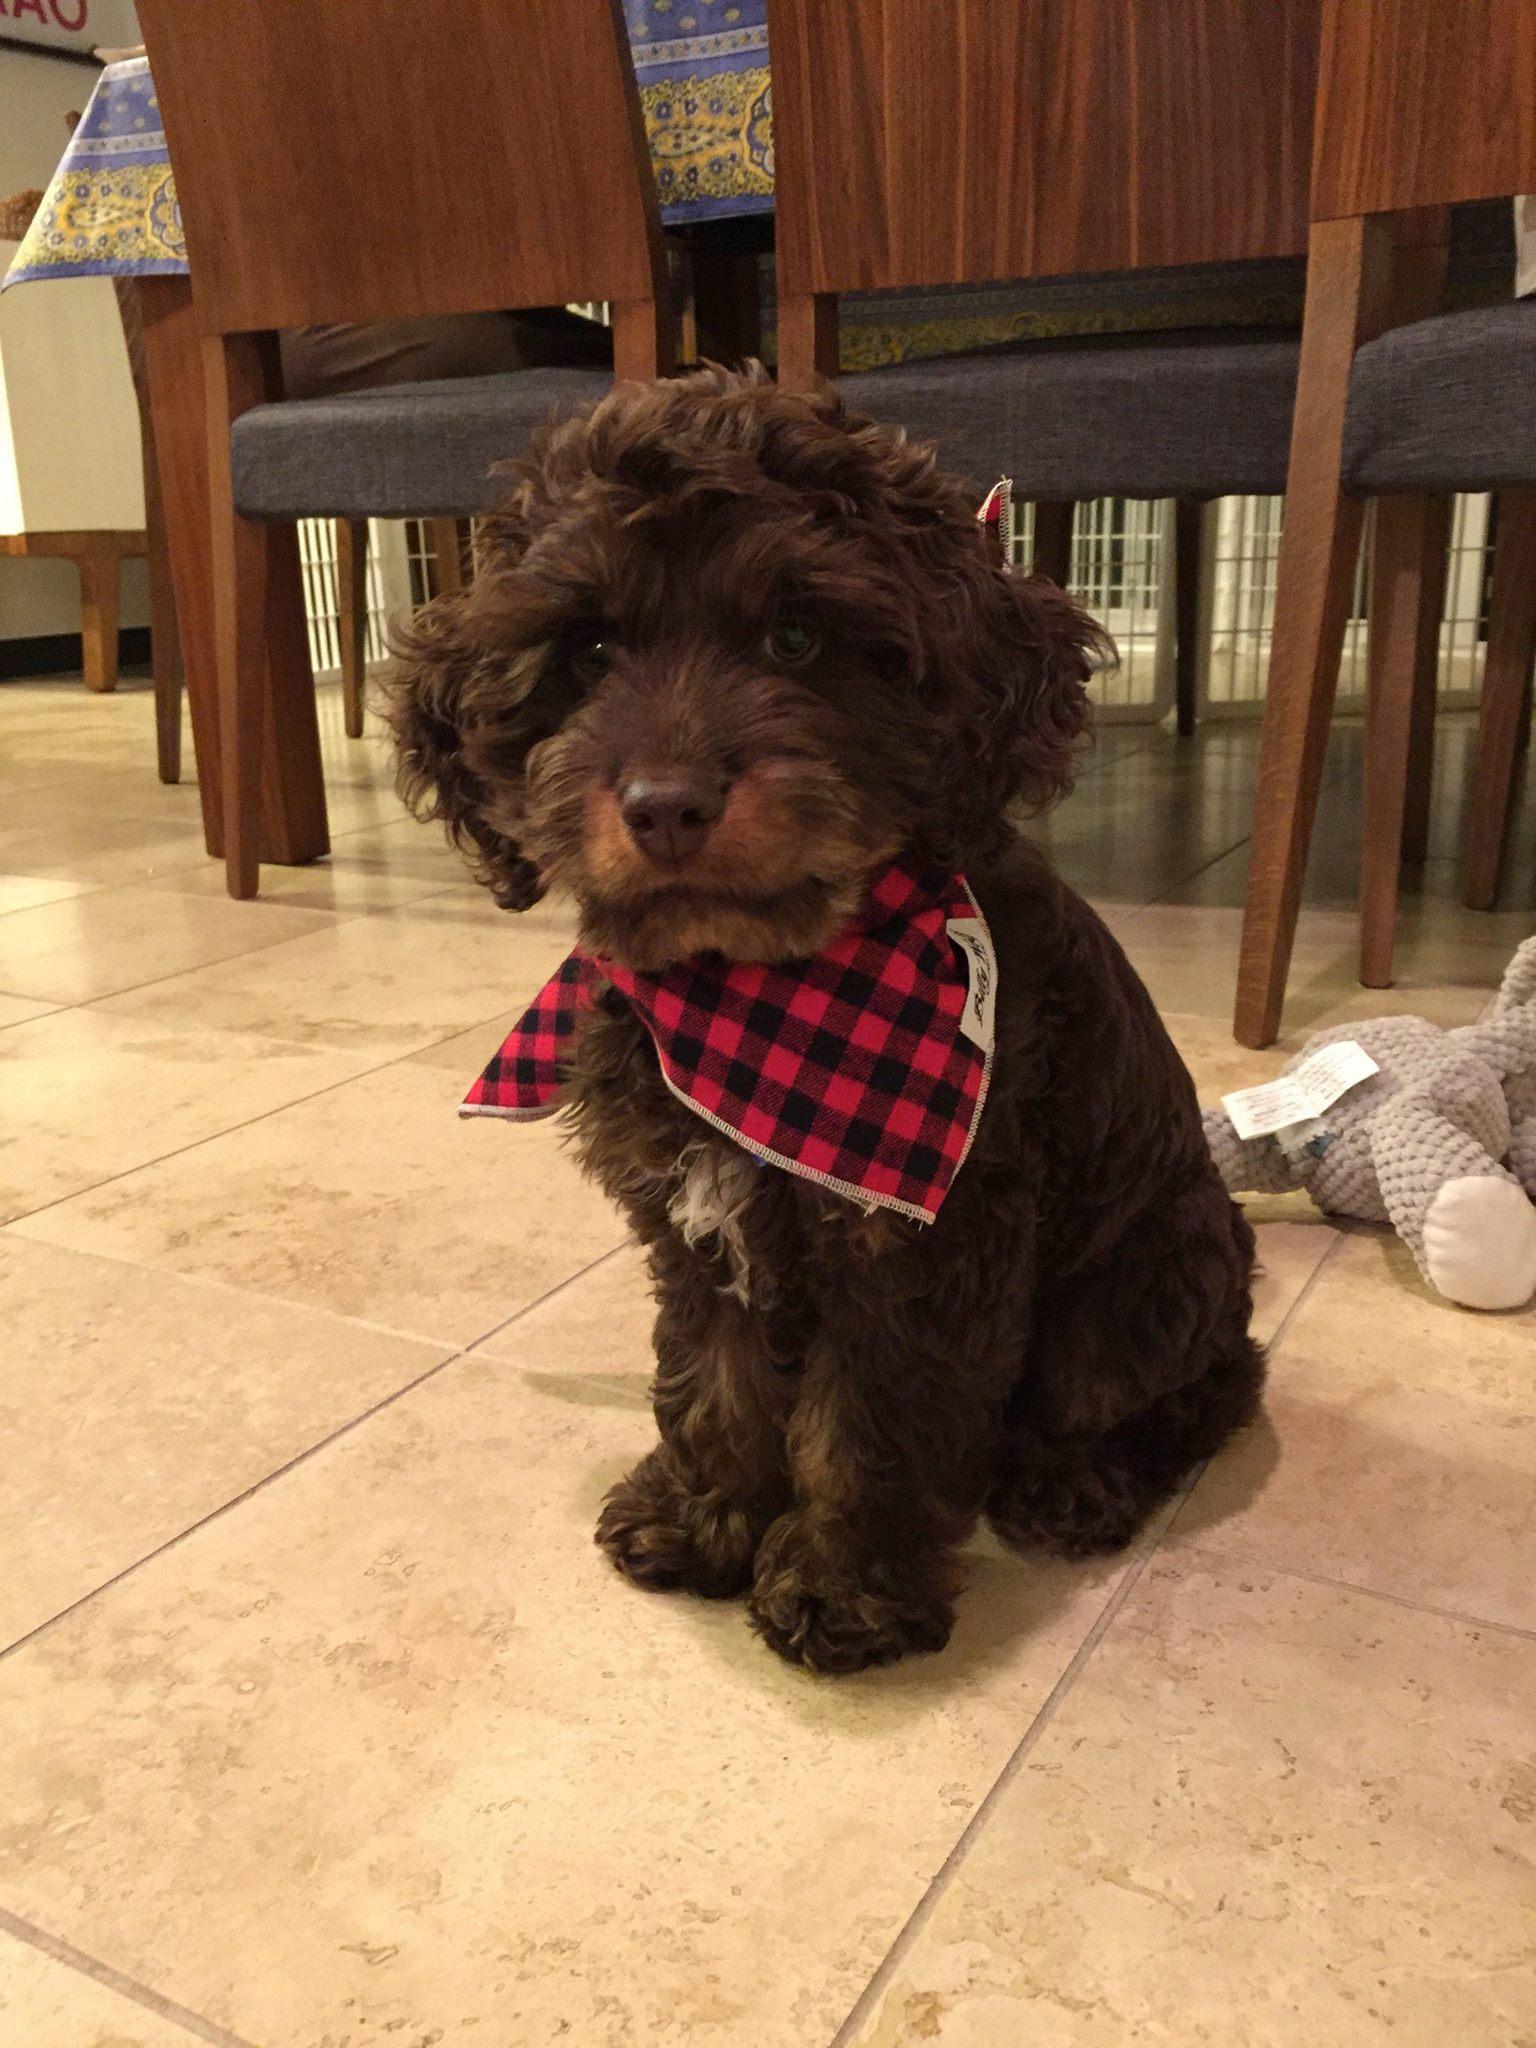 www.SugarPineDoodles.dog